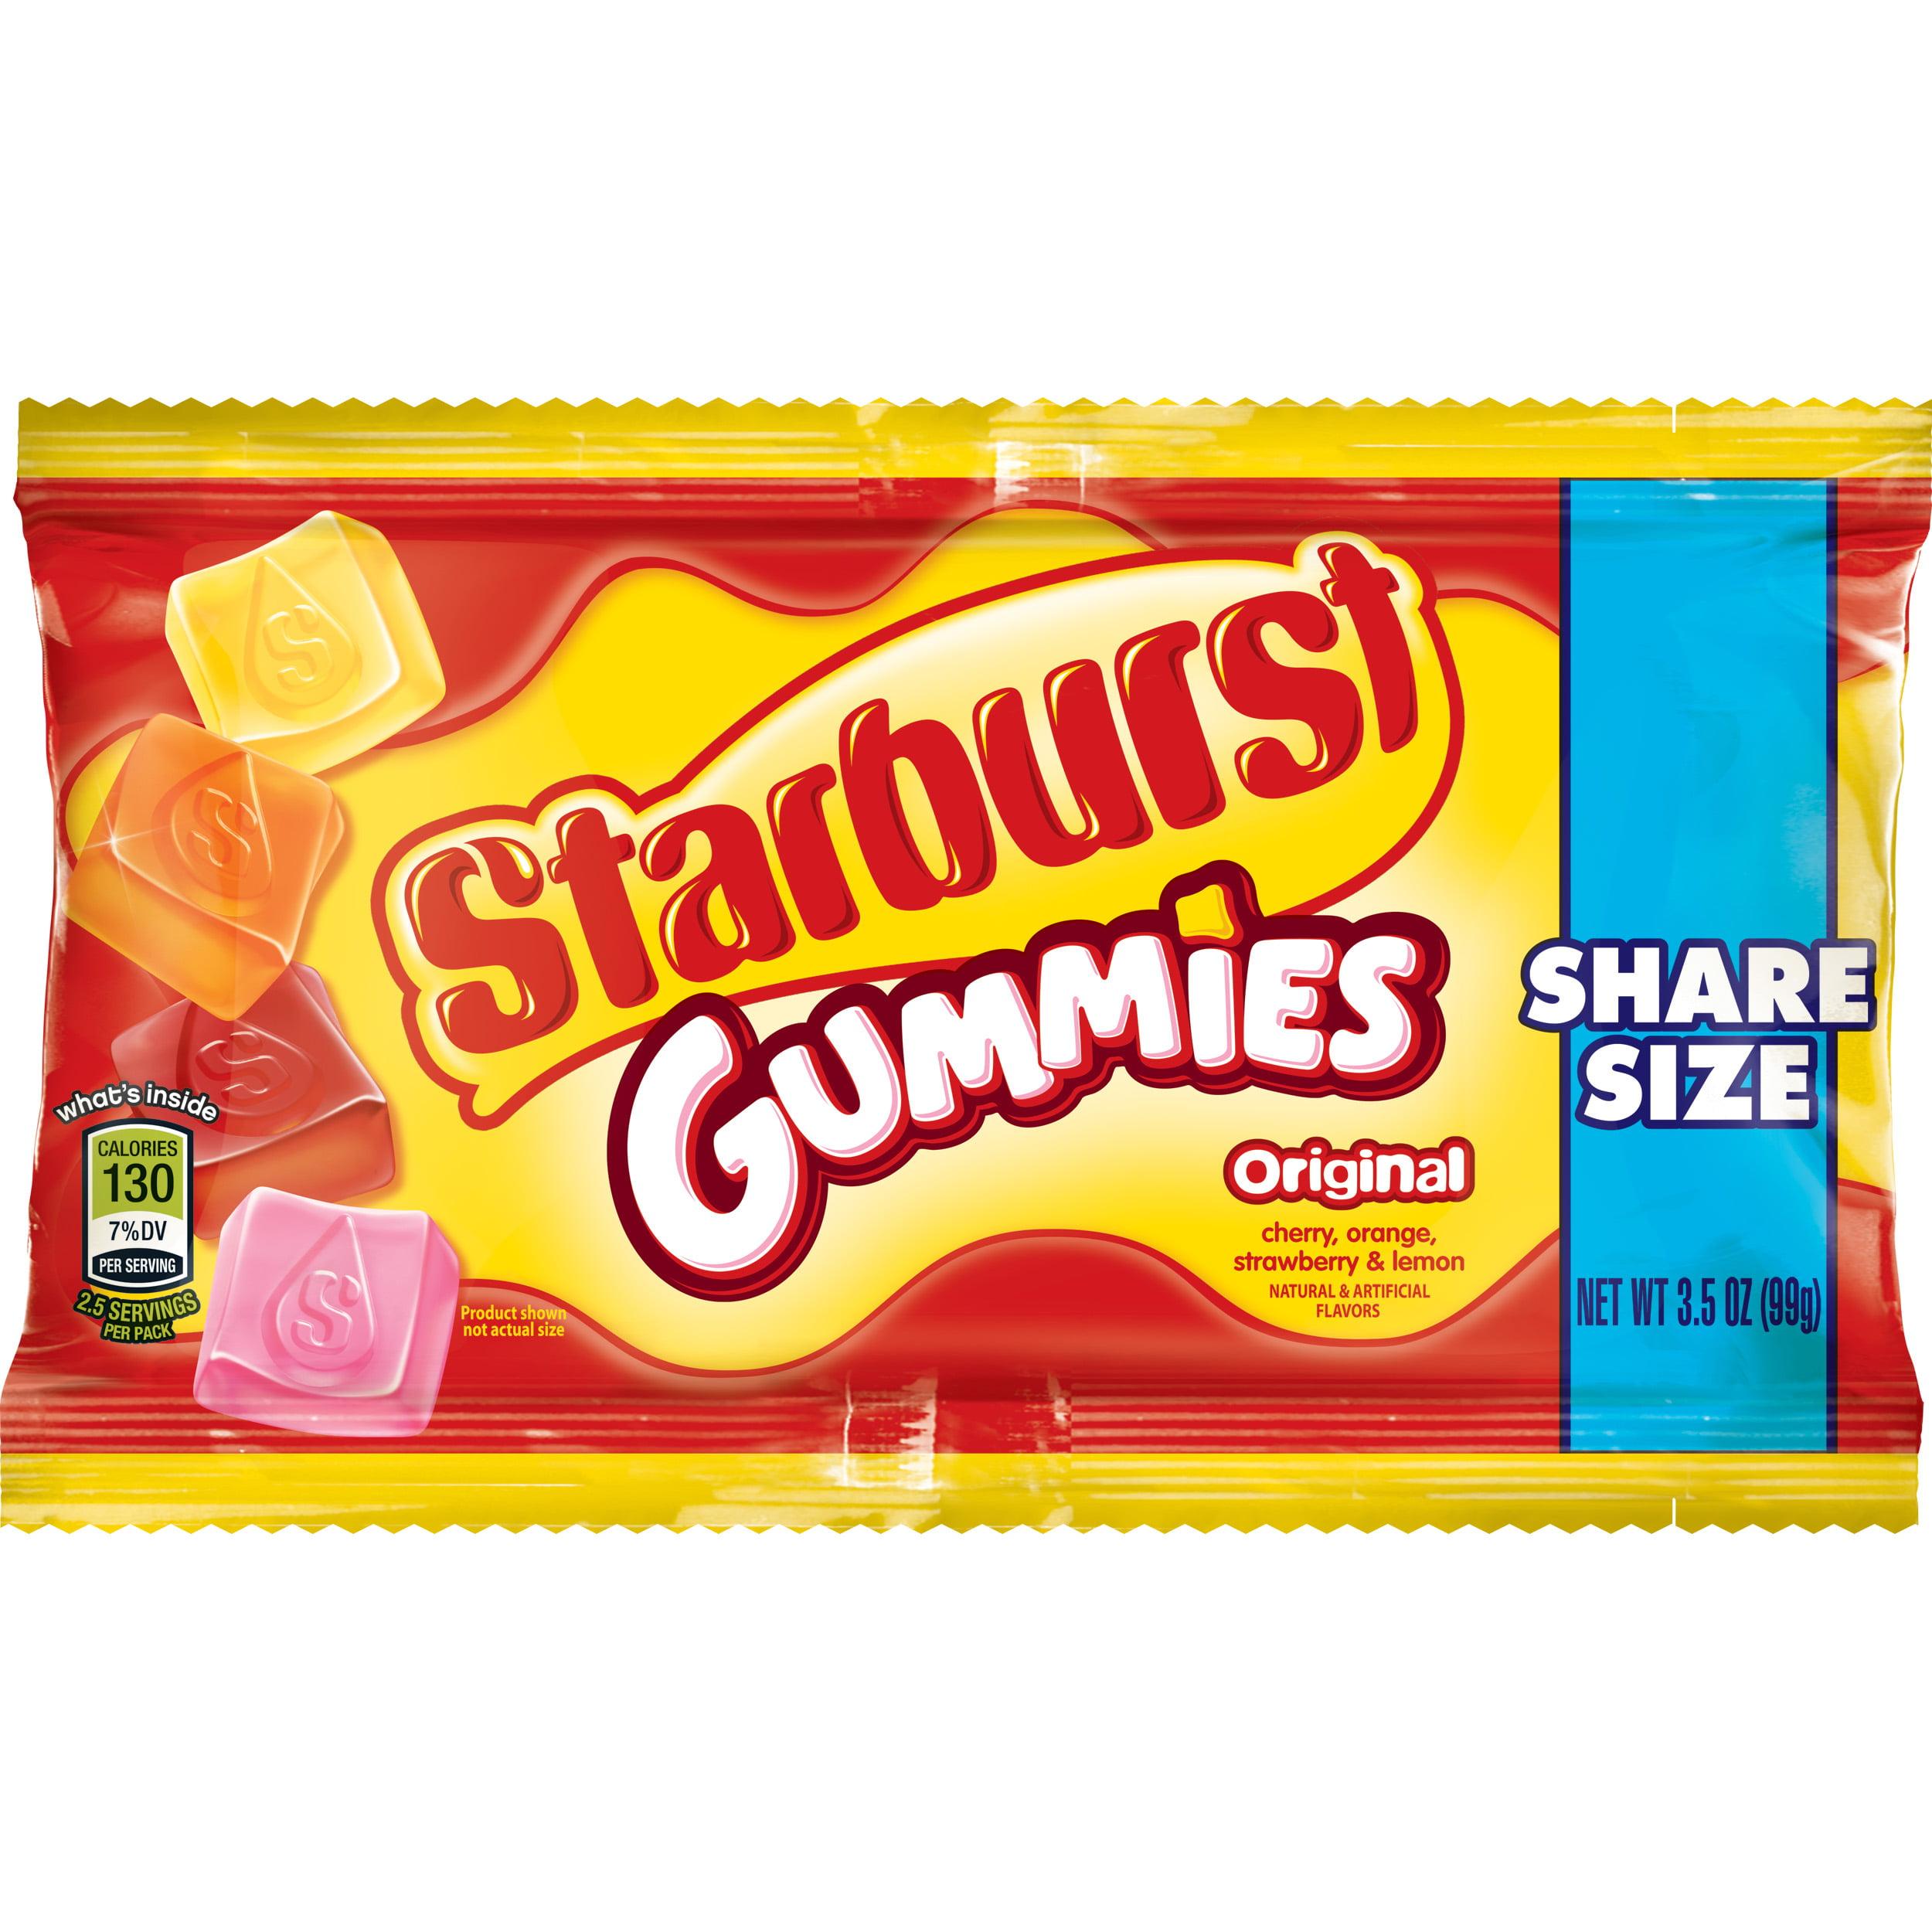 Starburst Gummies Originals Candy, 3.5 ounce